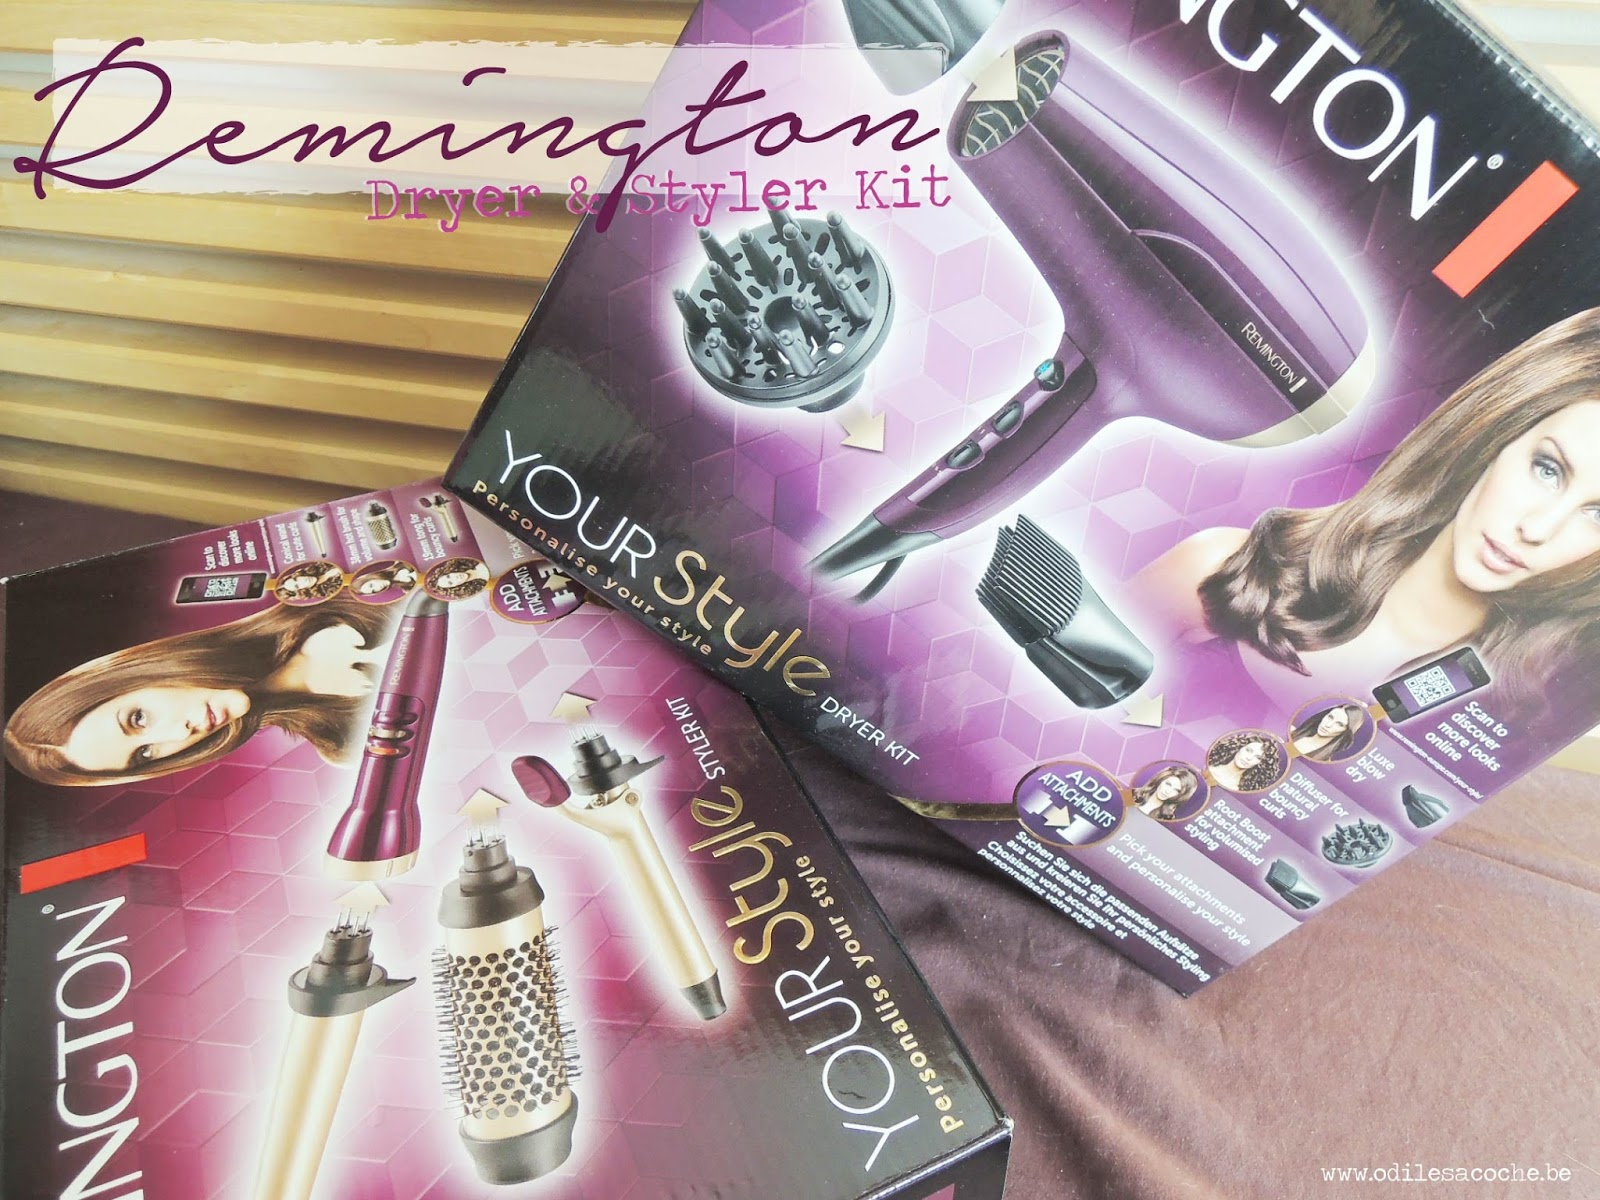 sèche cheveux fer a boucler remington